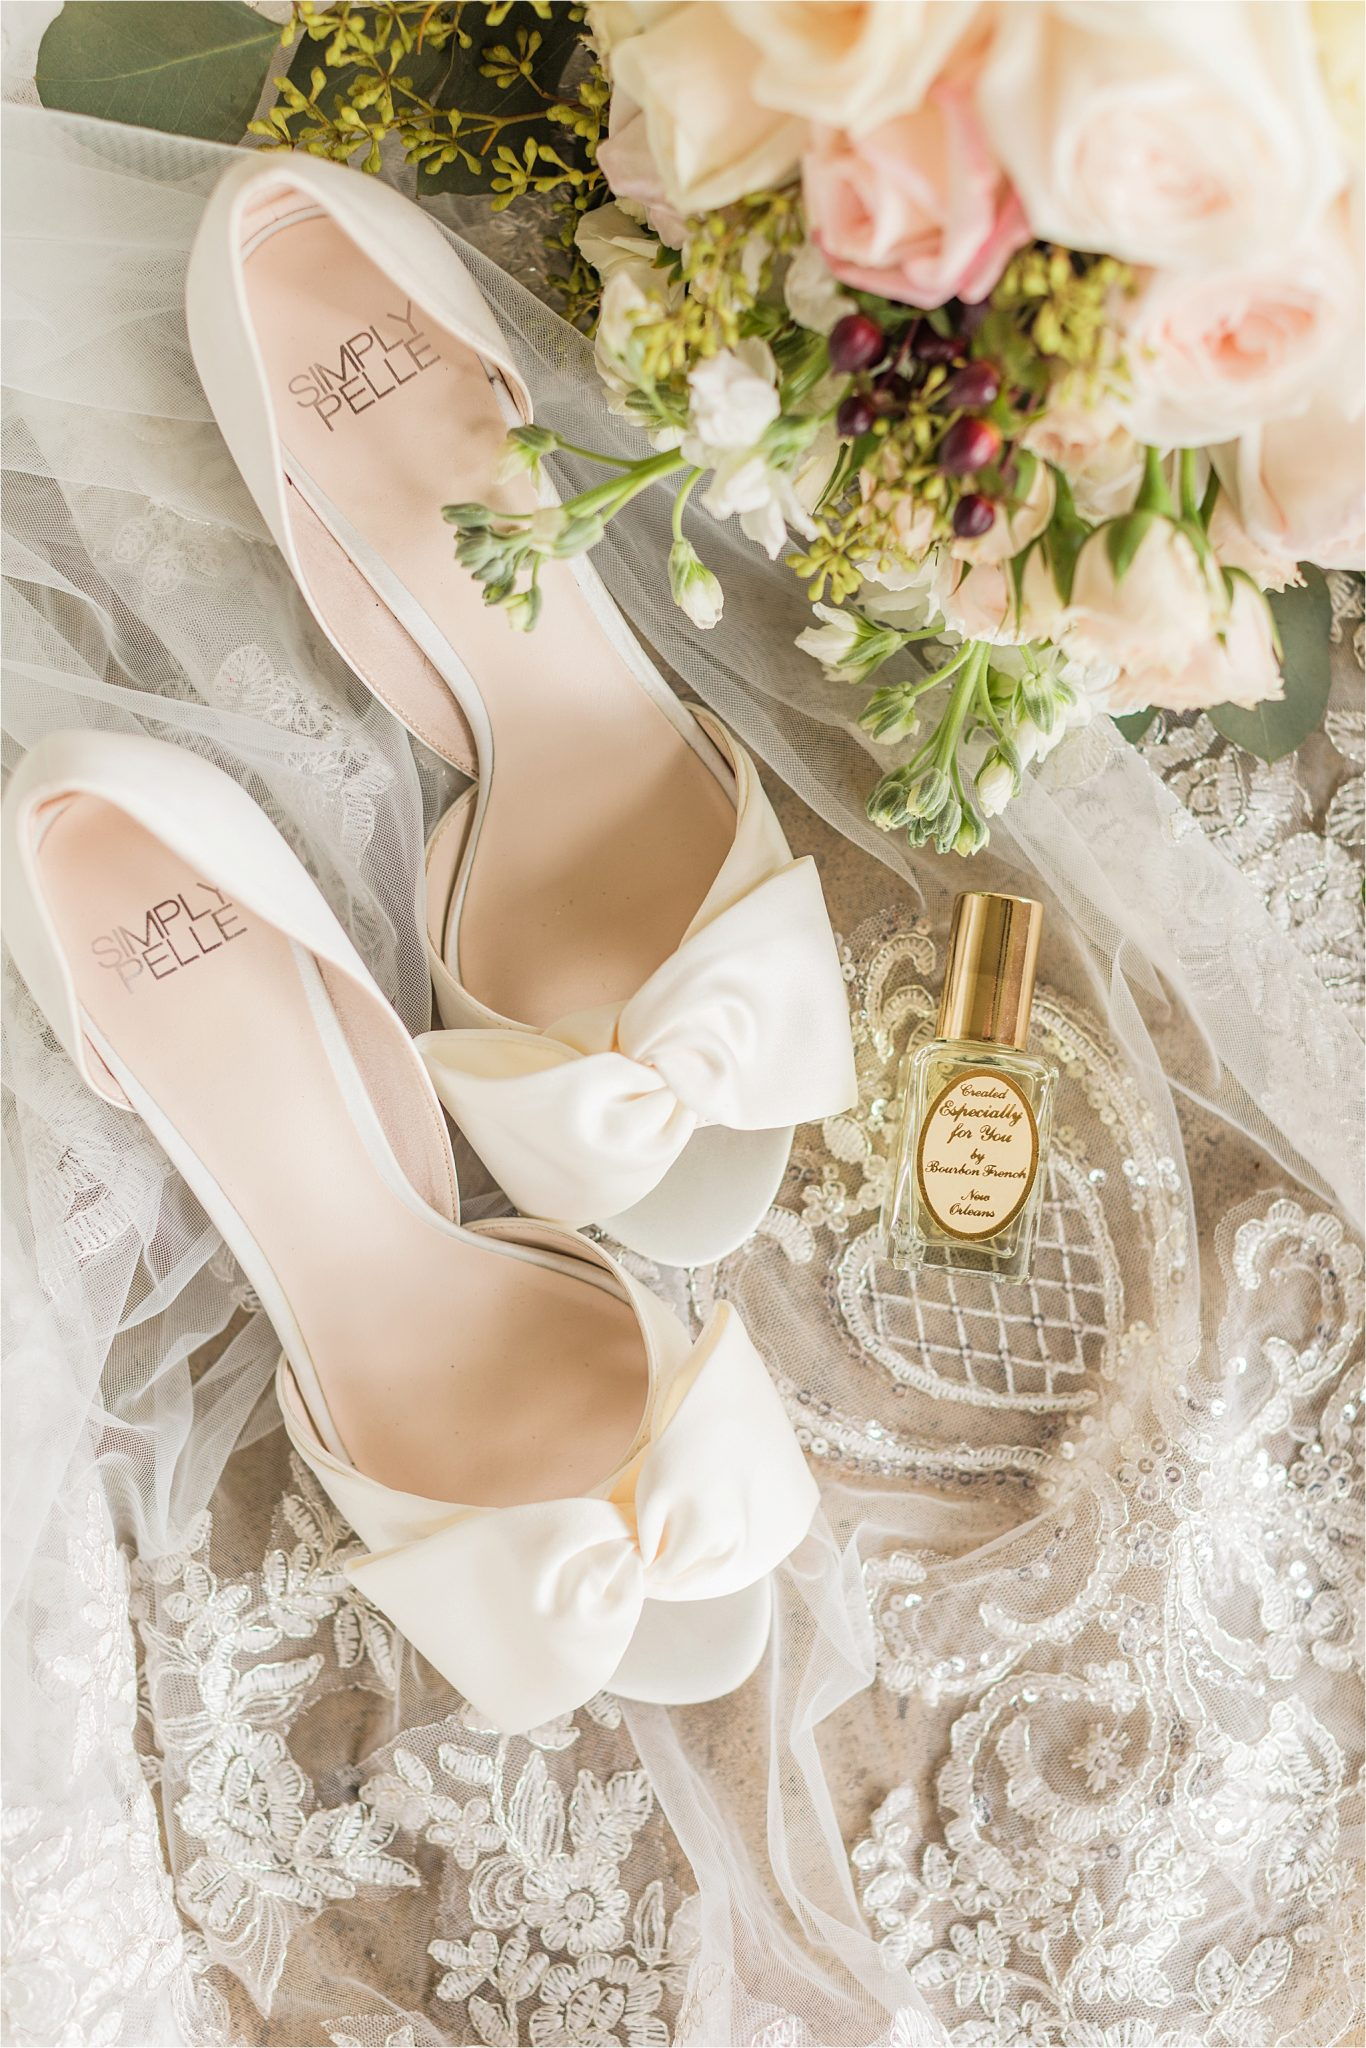 wedding-shoes-details-white-ribbon-bow-flats-parfume